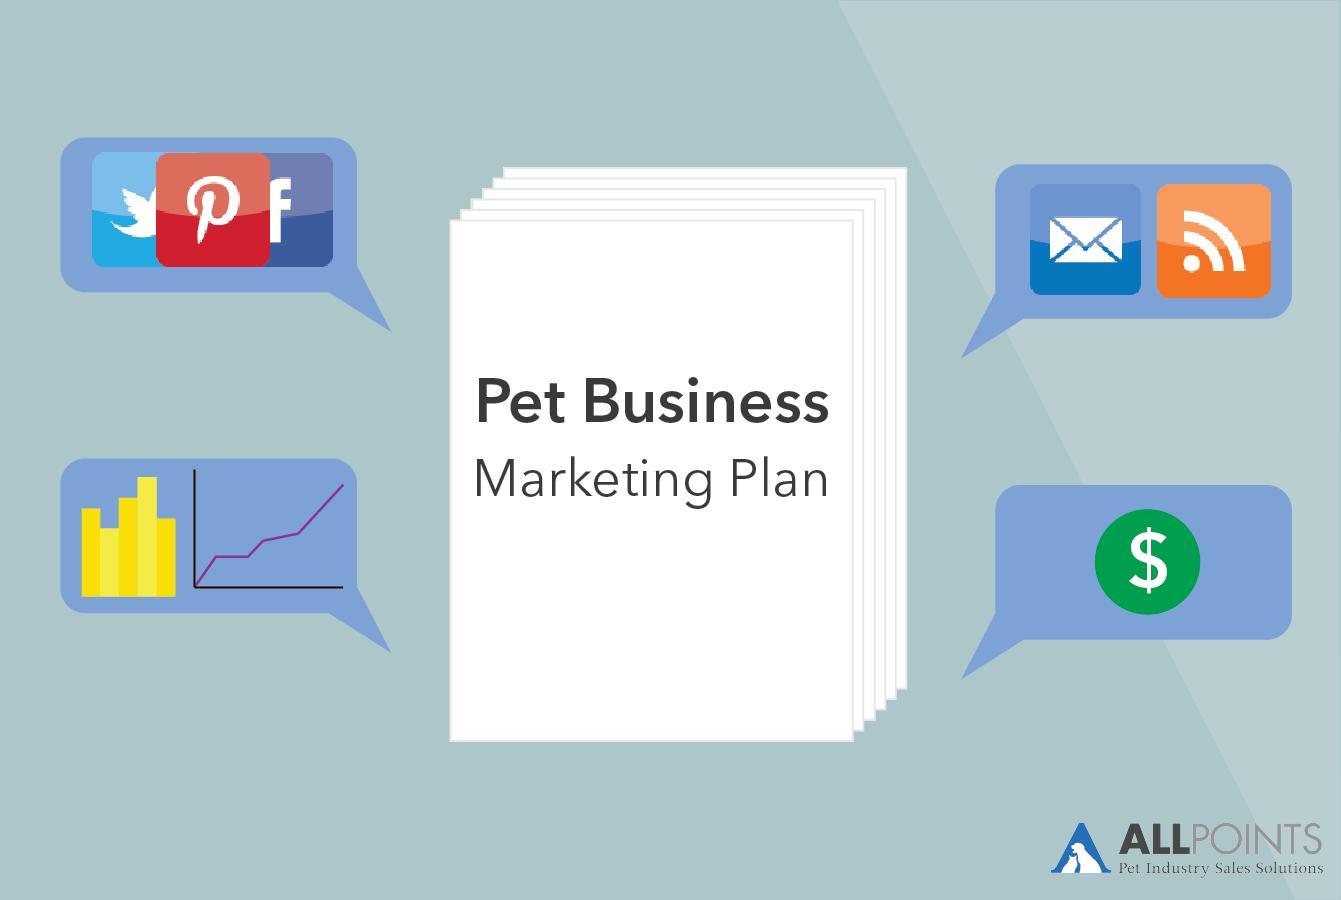 pet-business-marketing-guide-marketing-plan.png